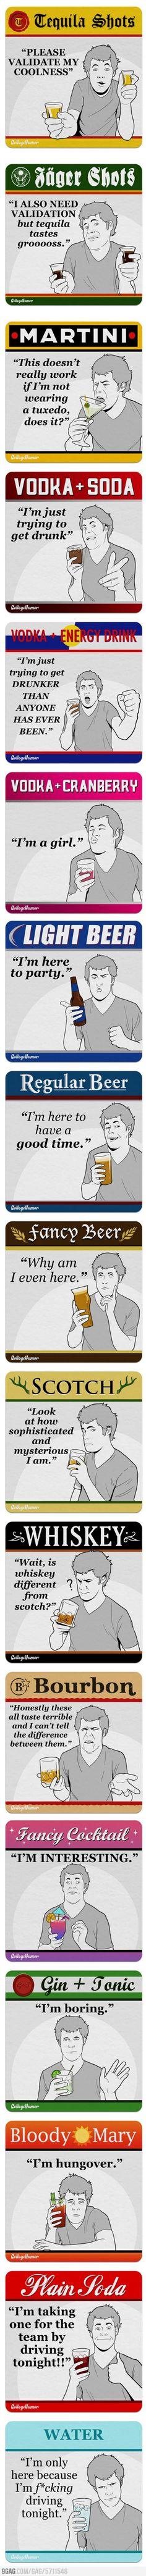 What You're Saying With Your Choice of Drink    SOOOOOOOOOO FUNNY!!!!